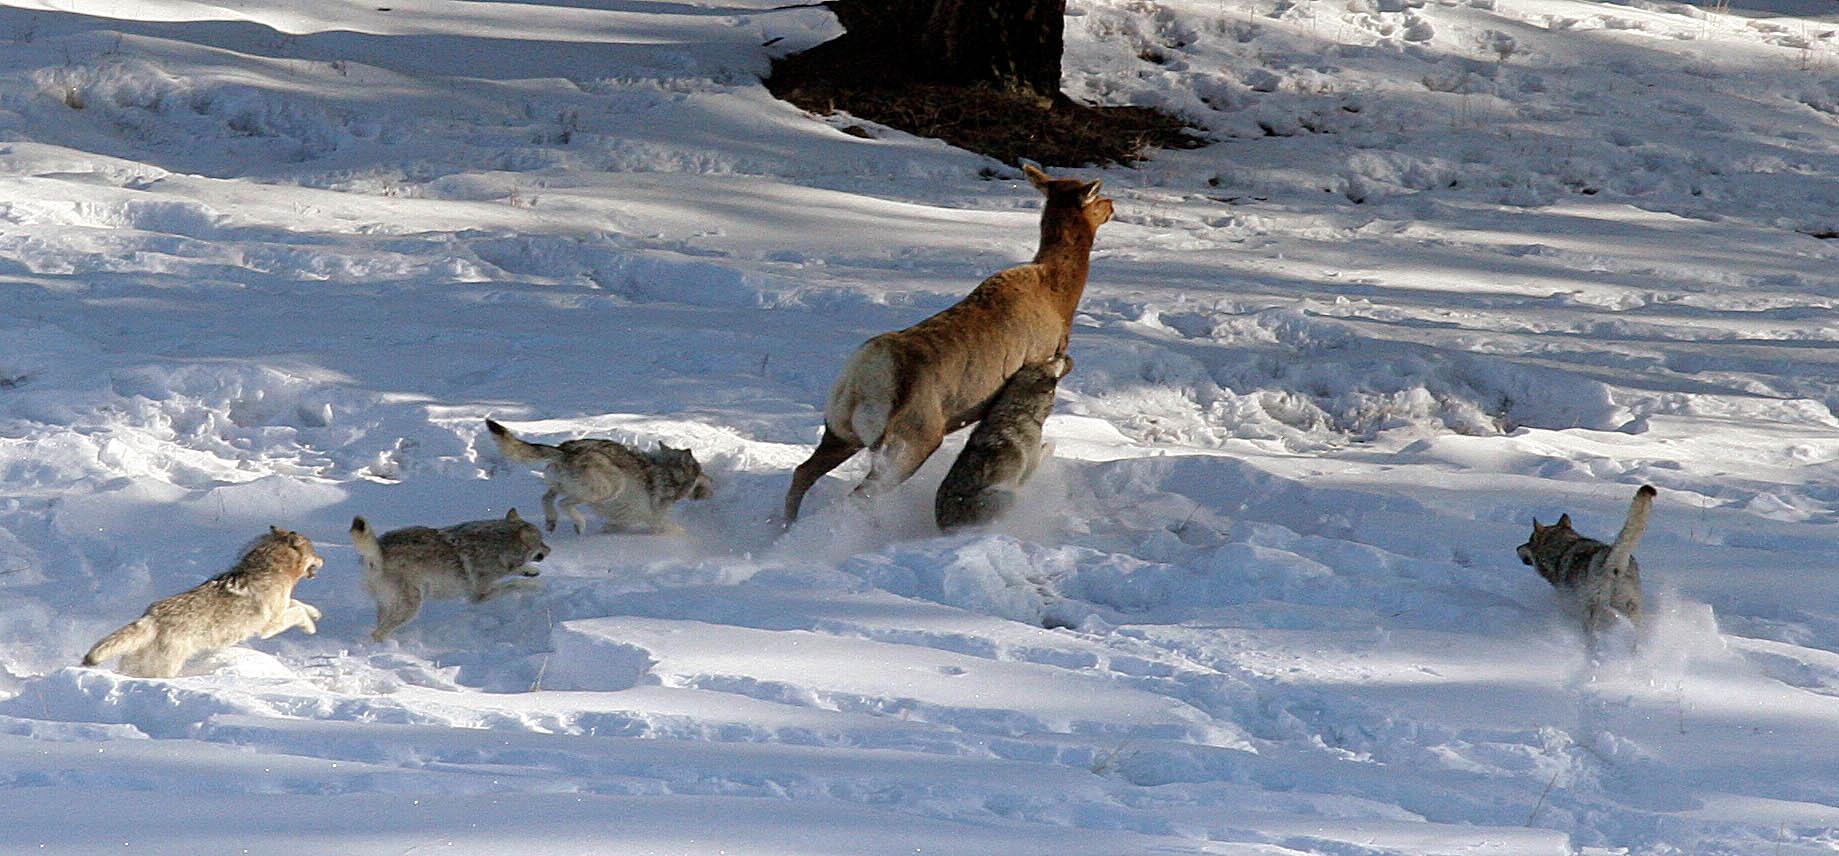 President Trump Signs Bill Lifting Ban on 'Predator Control' Hunting Practices in Alaska